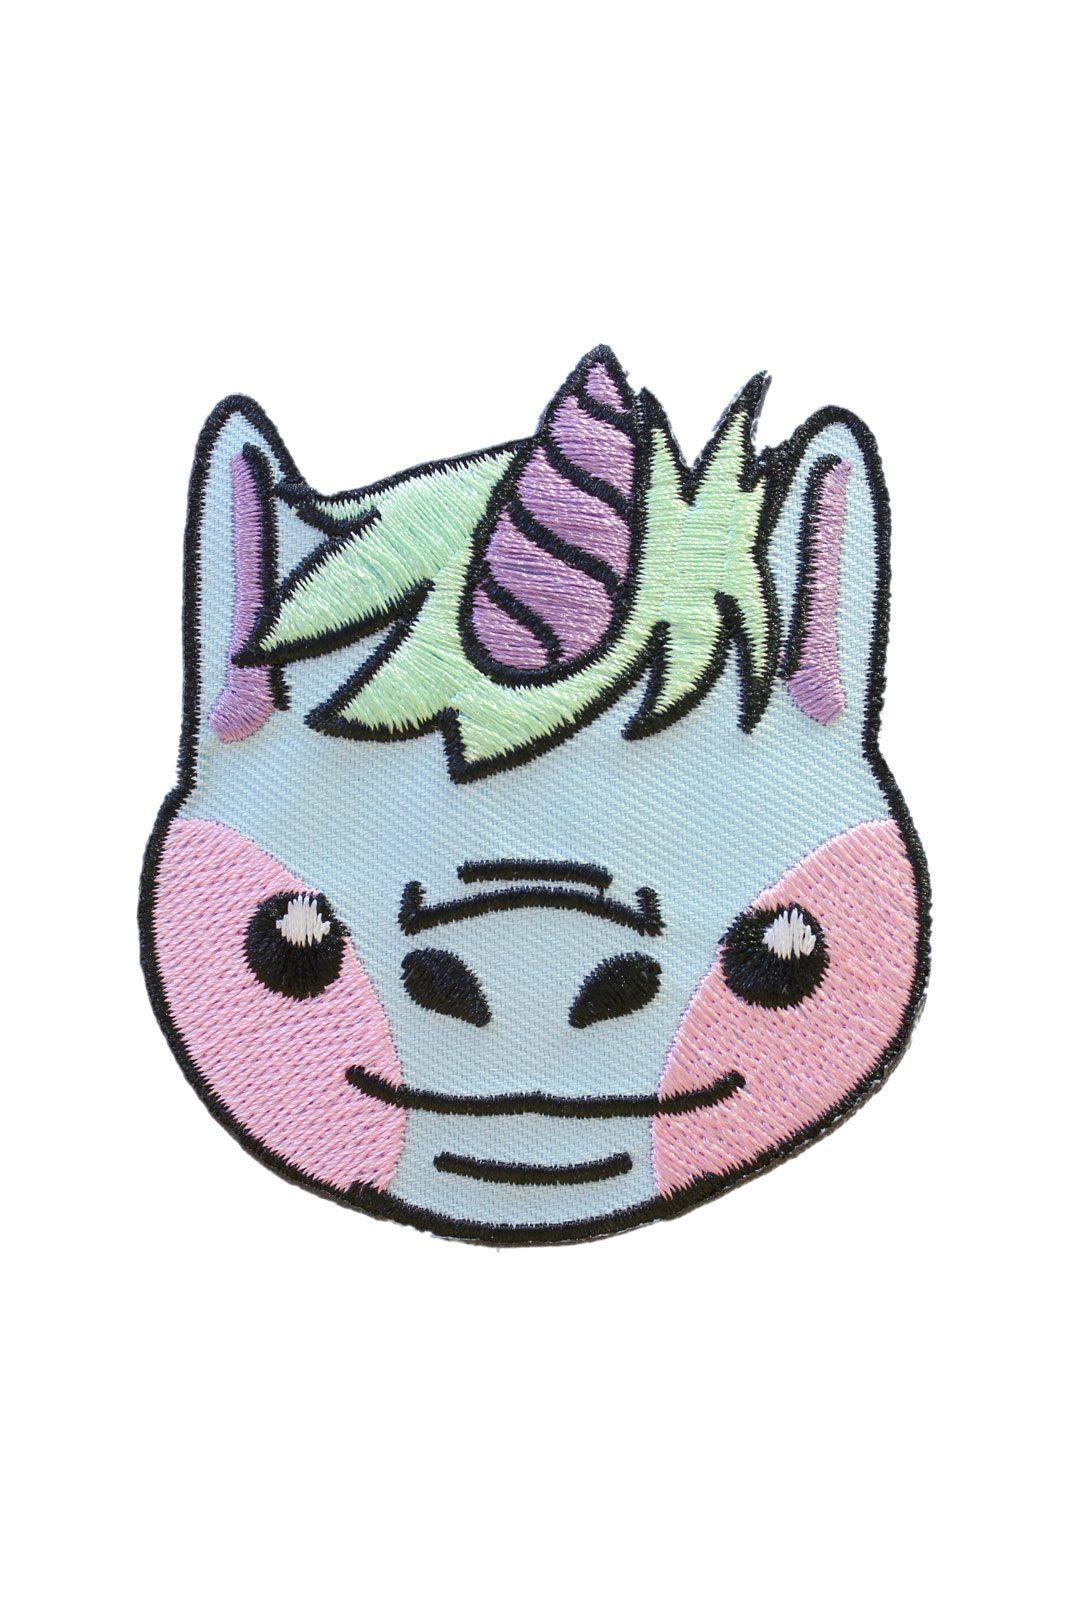 Kawaii Unicorn Patch